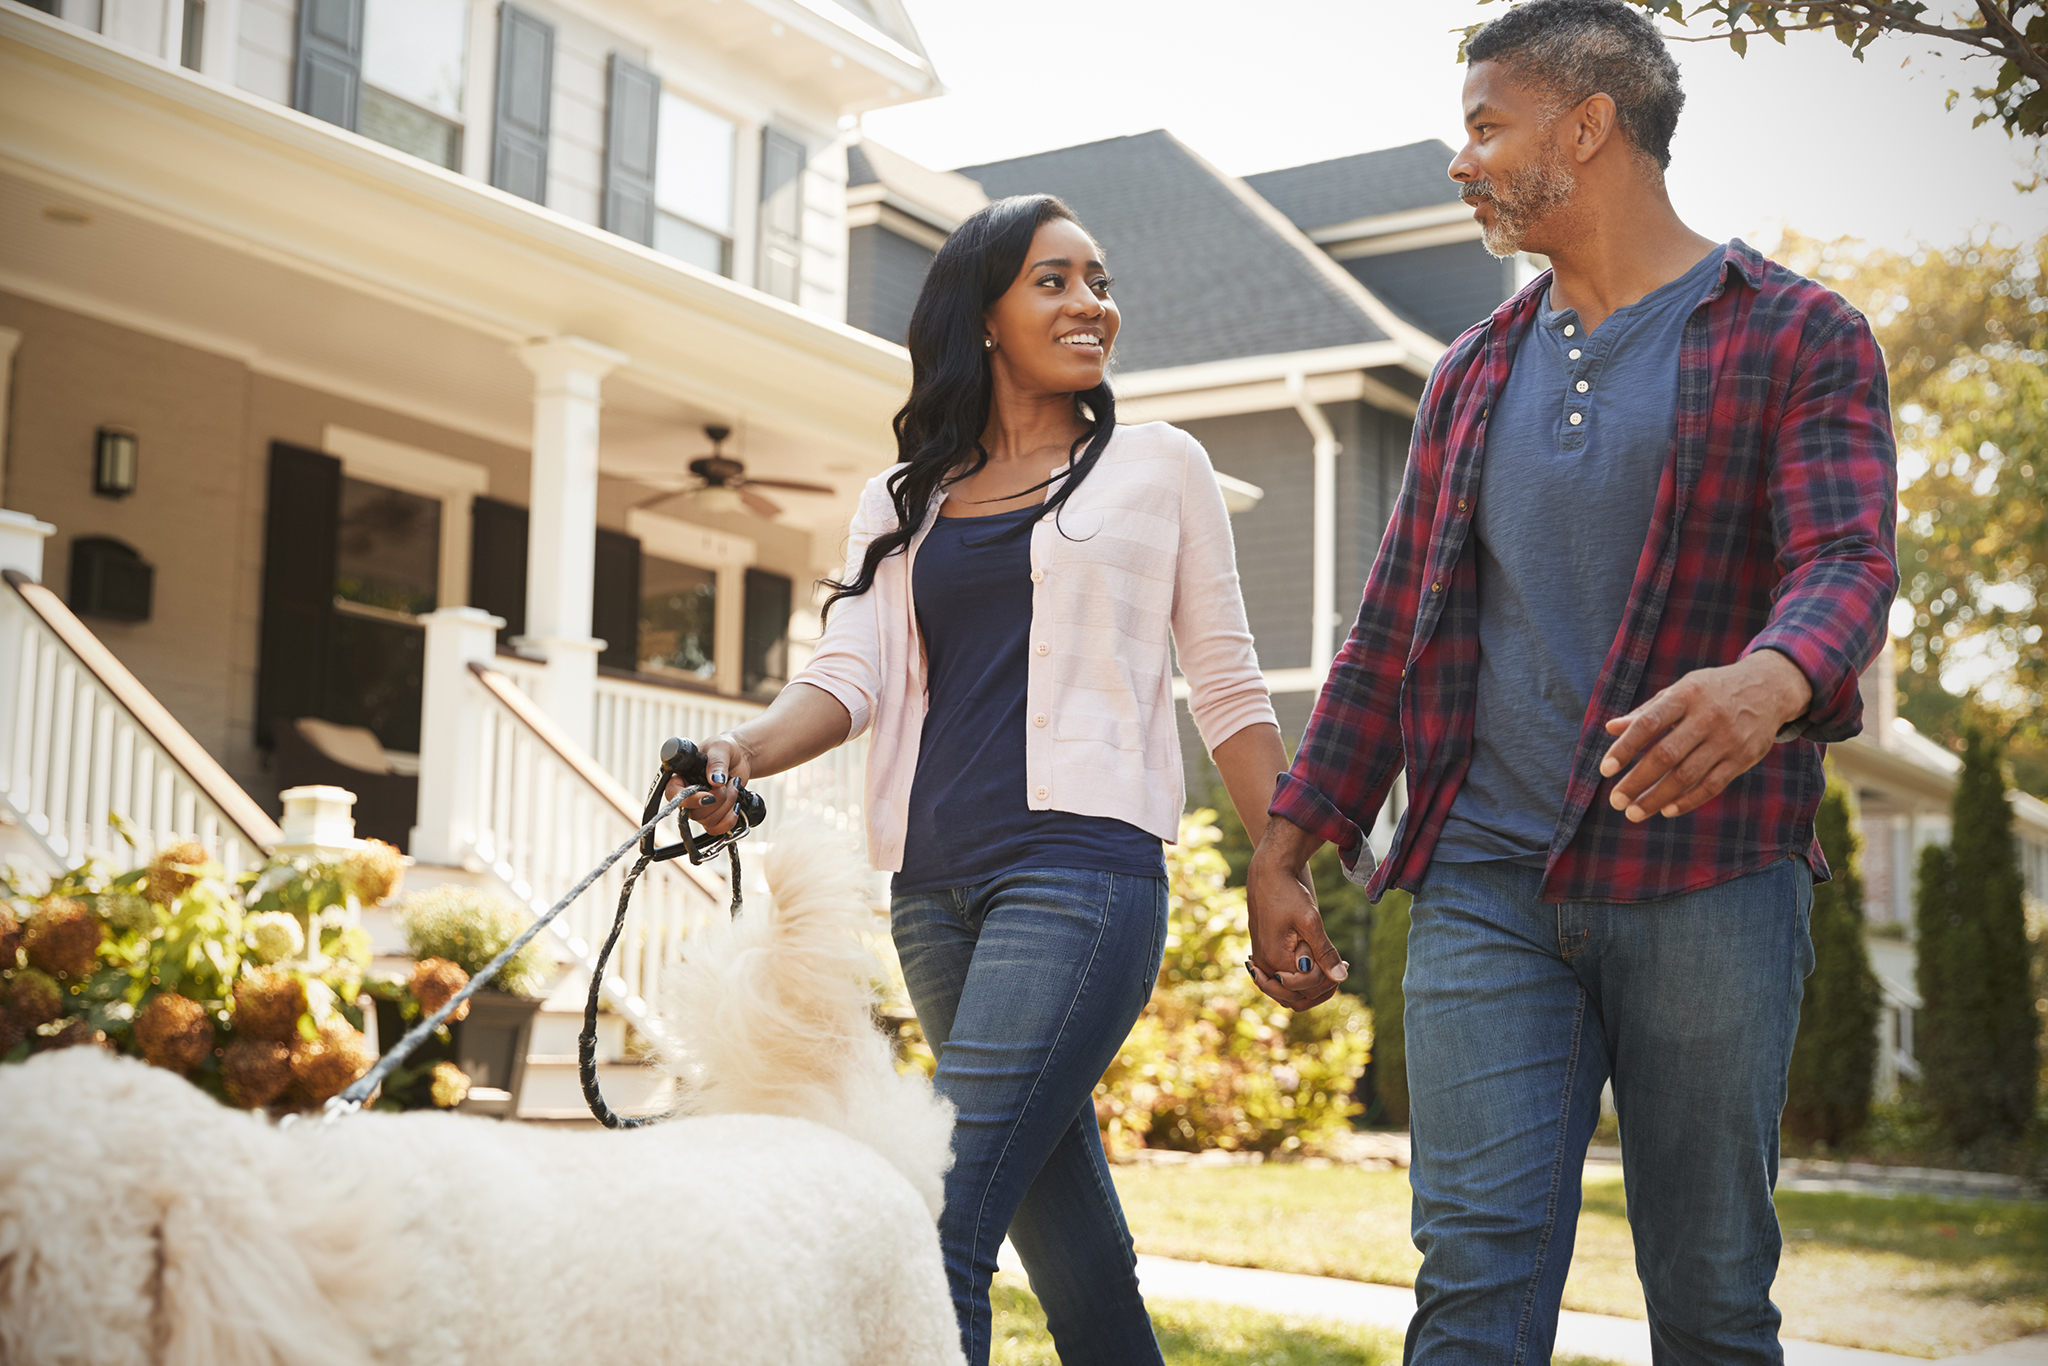 couple-walking-dog-along-suburban-street-PLH8K3F